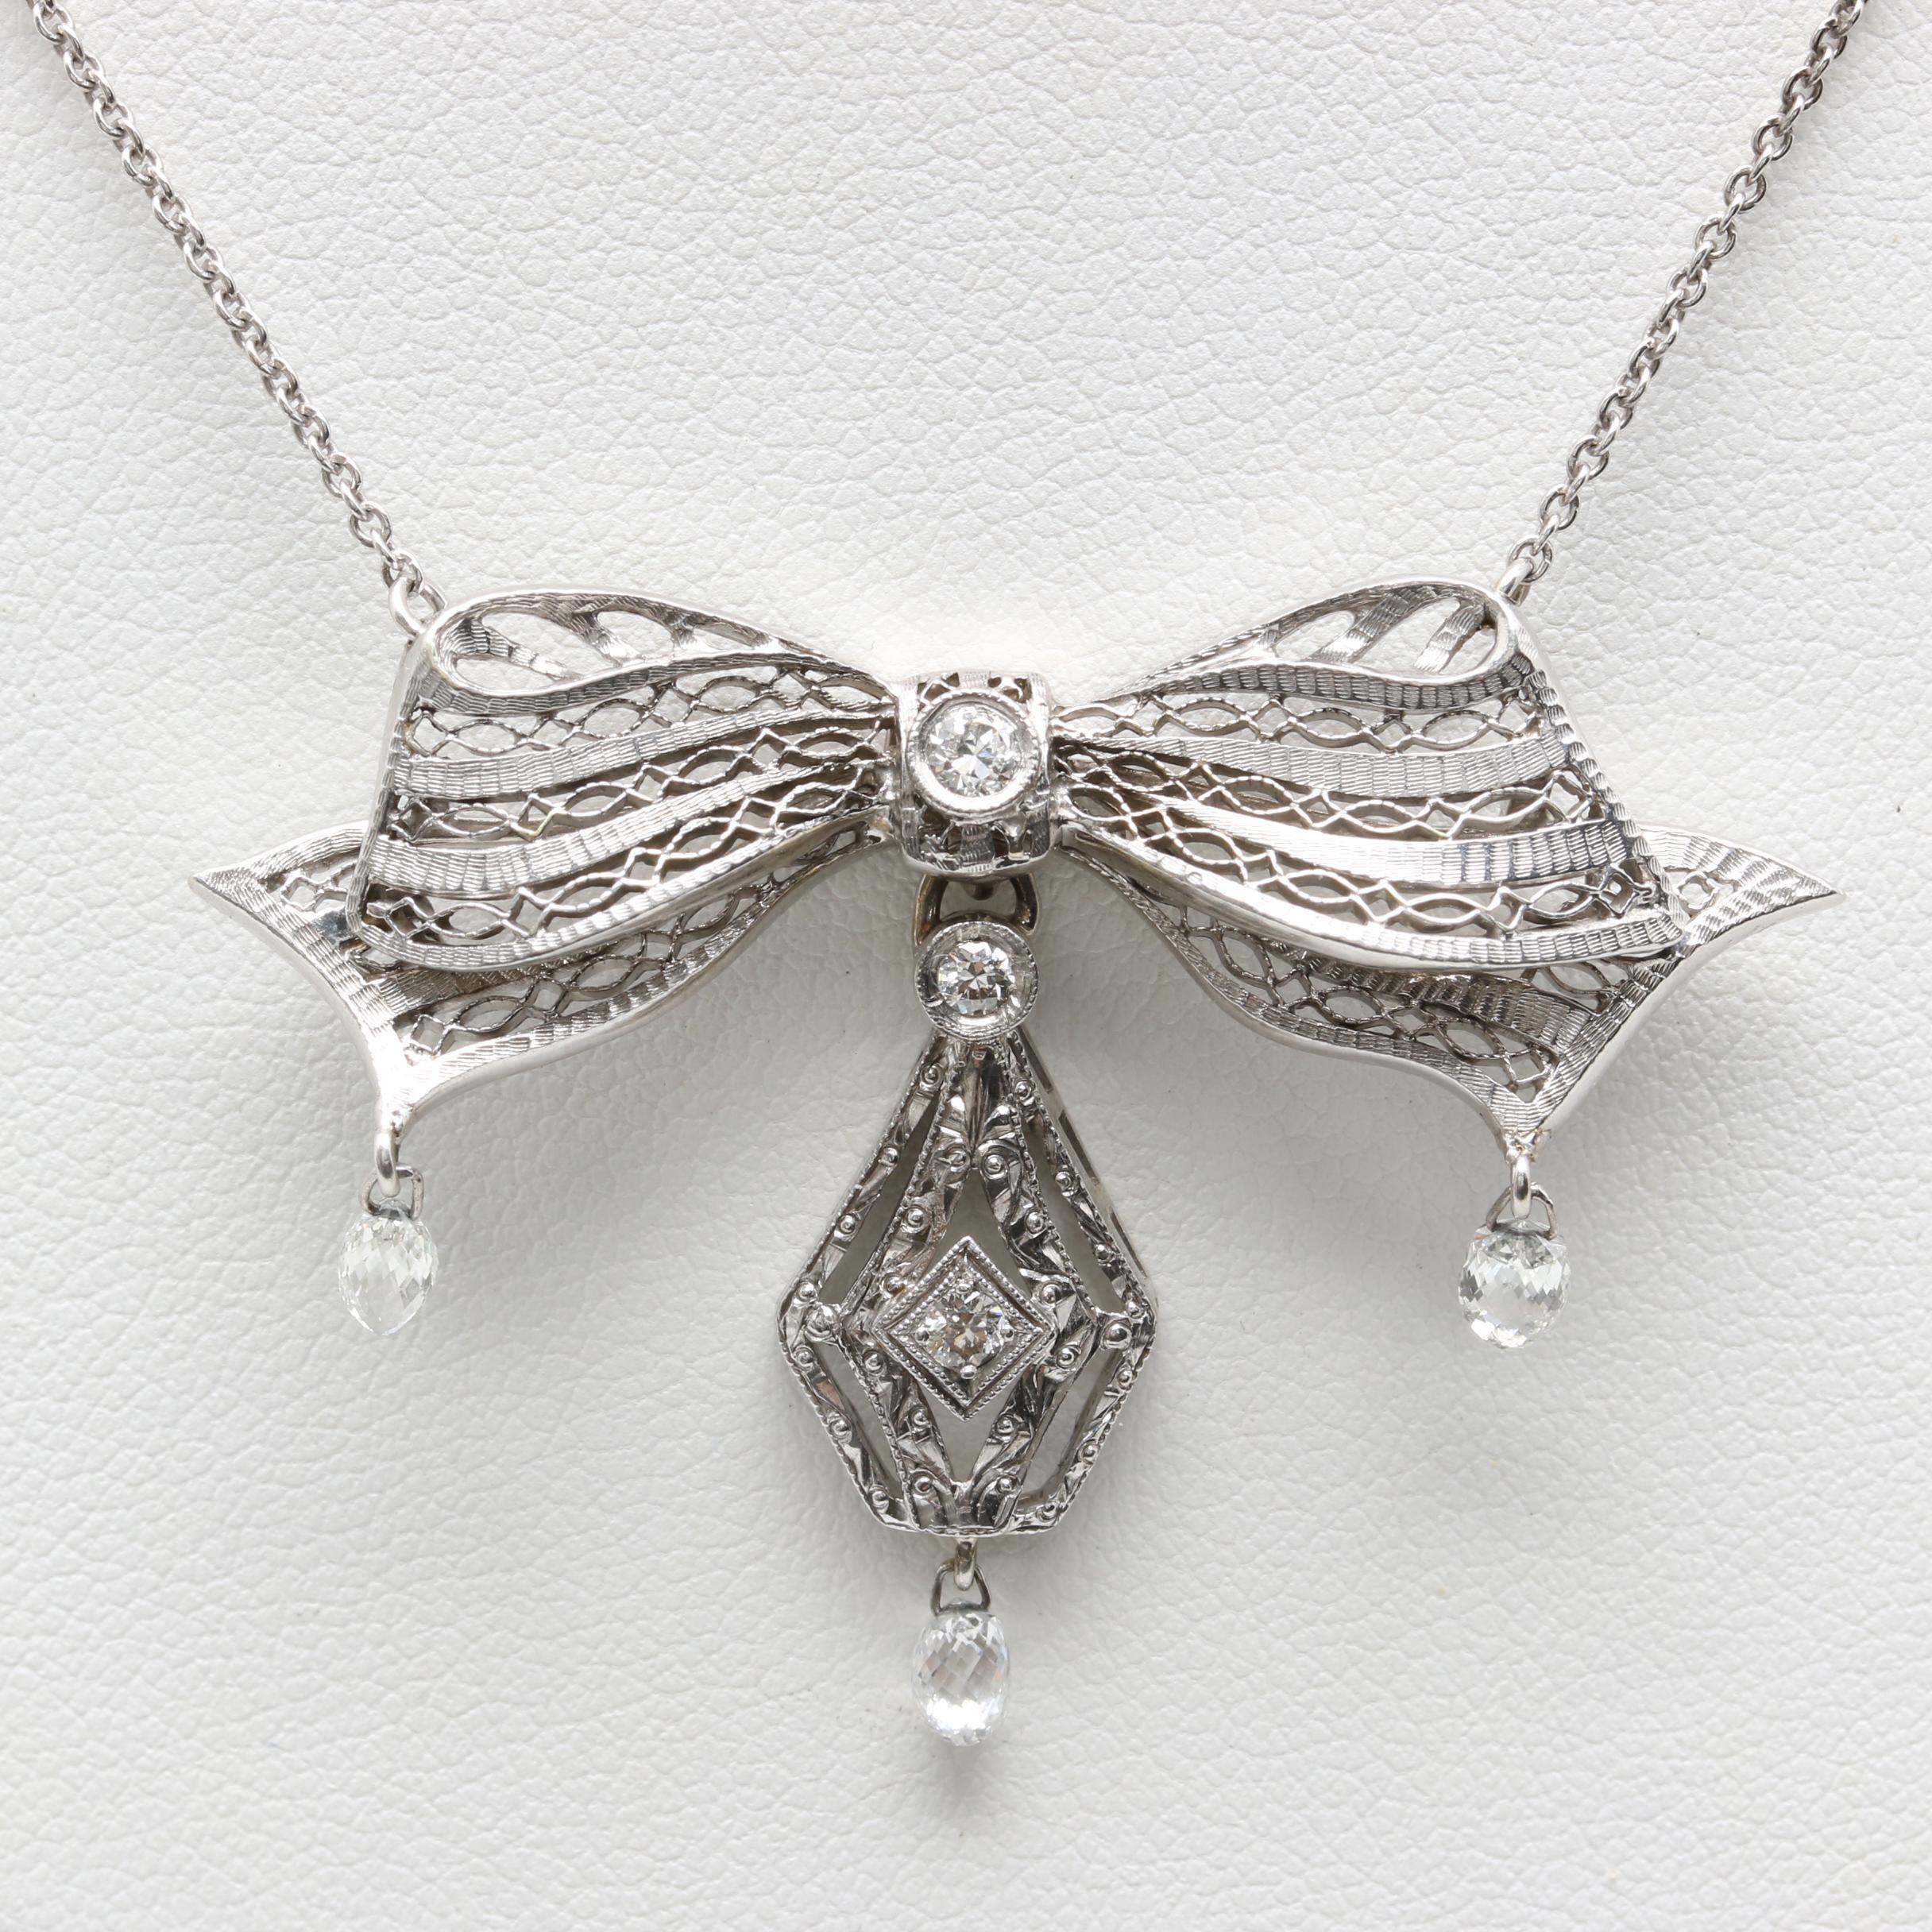 14K White Gold and Platinum Diamond Necklace